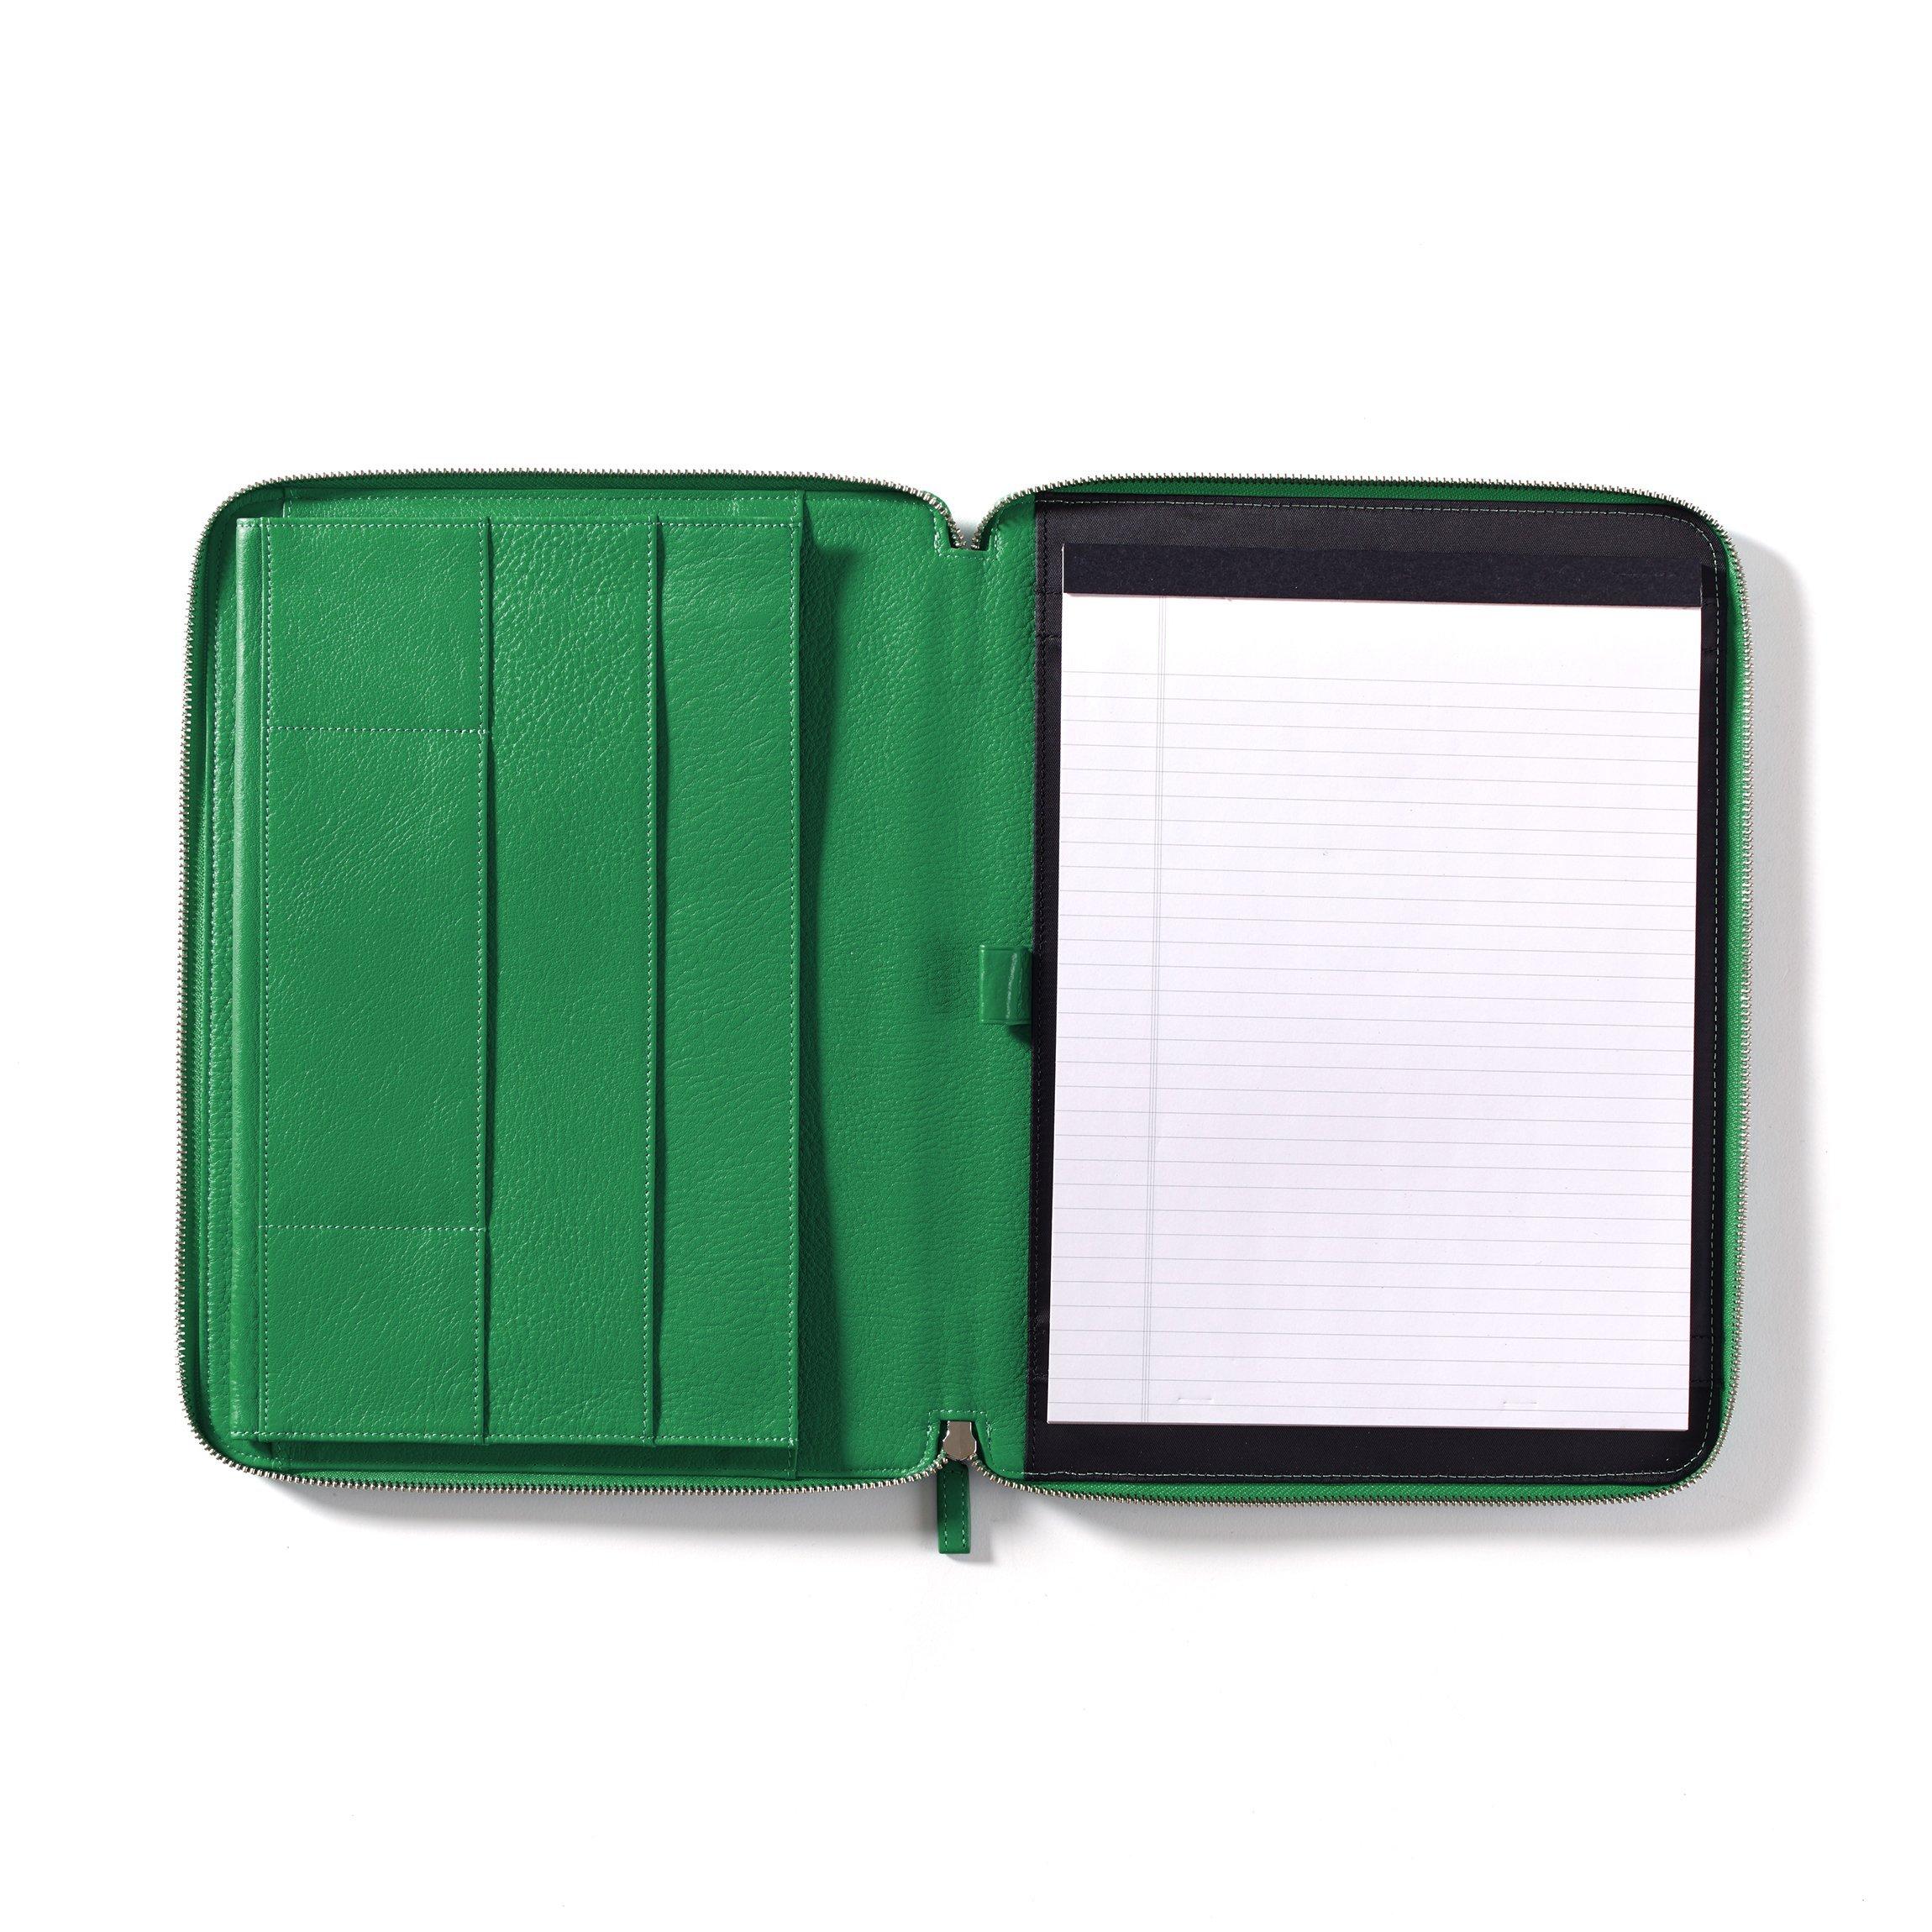 Leatherology Executive Zippered Portfolio with Interior iPad Pocket - Full Grain Leather - Kelly Green (green)